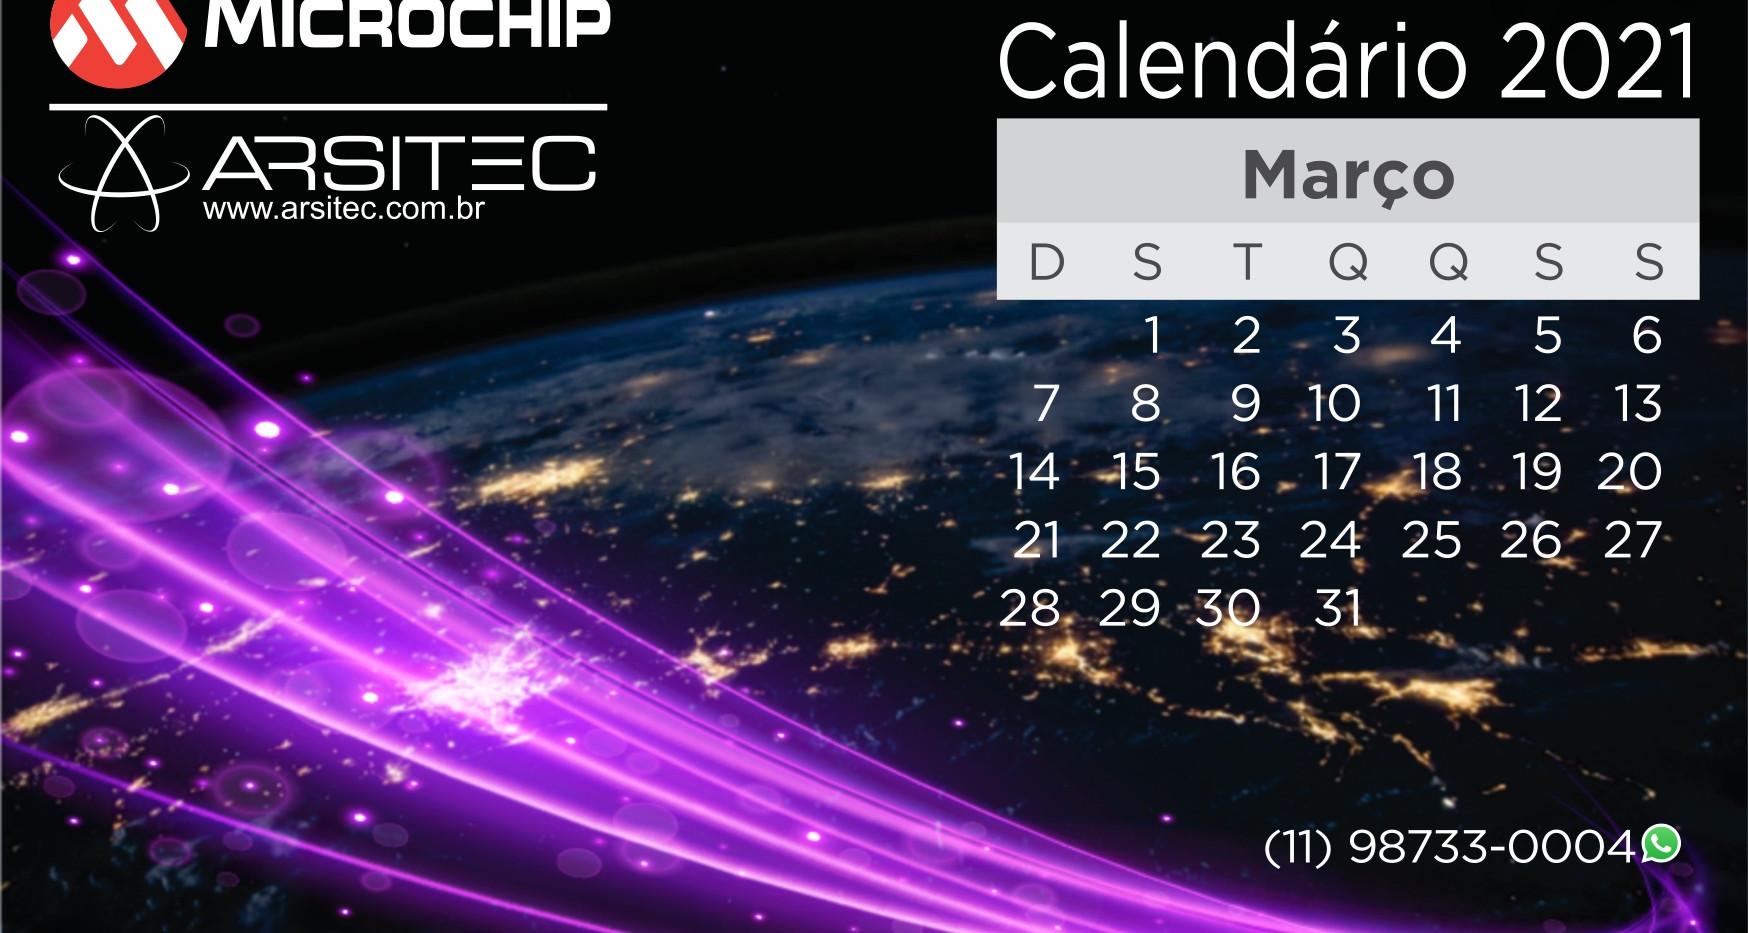 7 - Mar.jpg